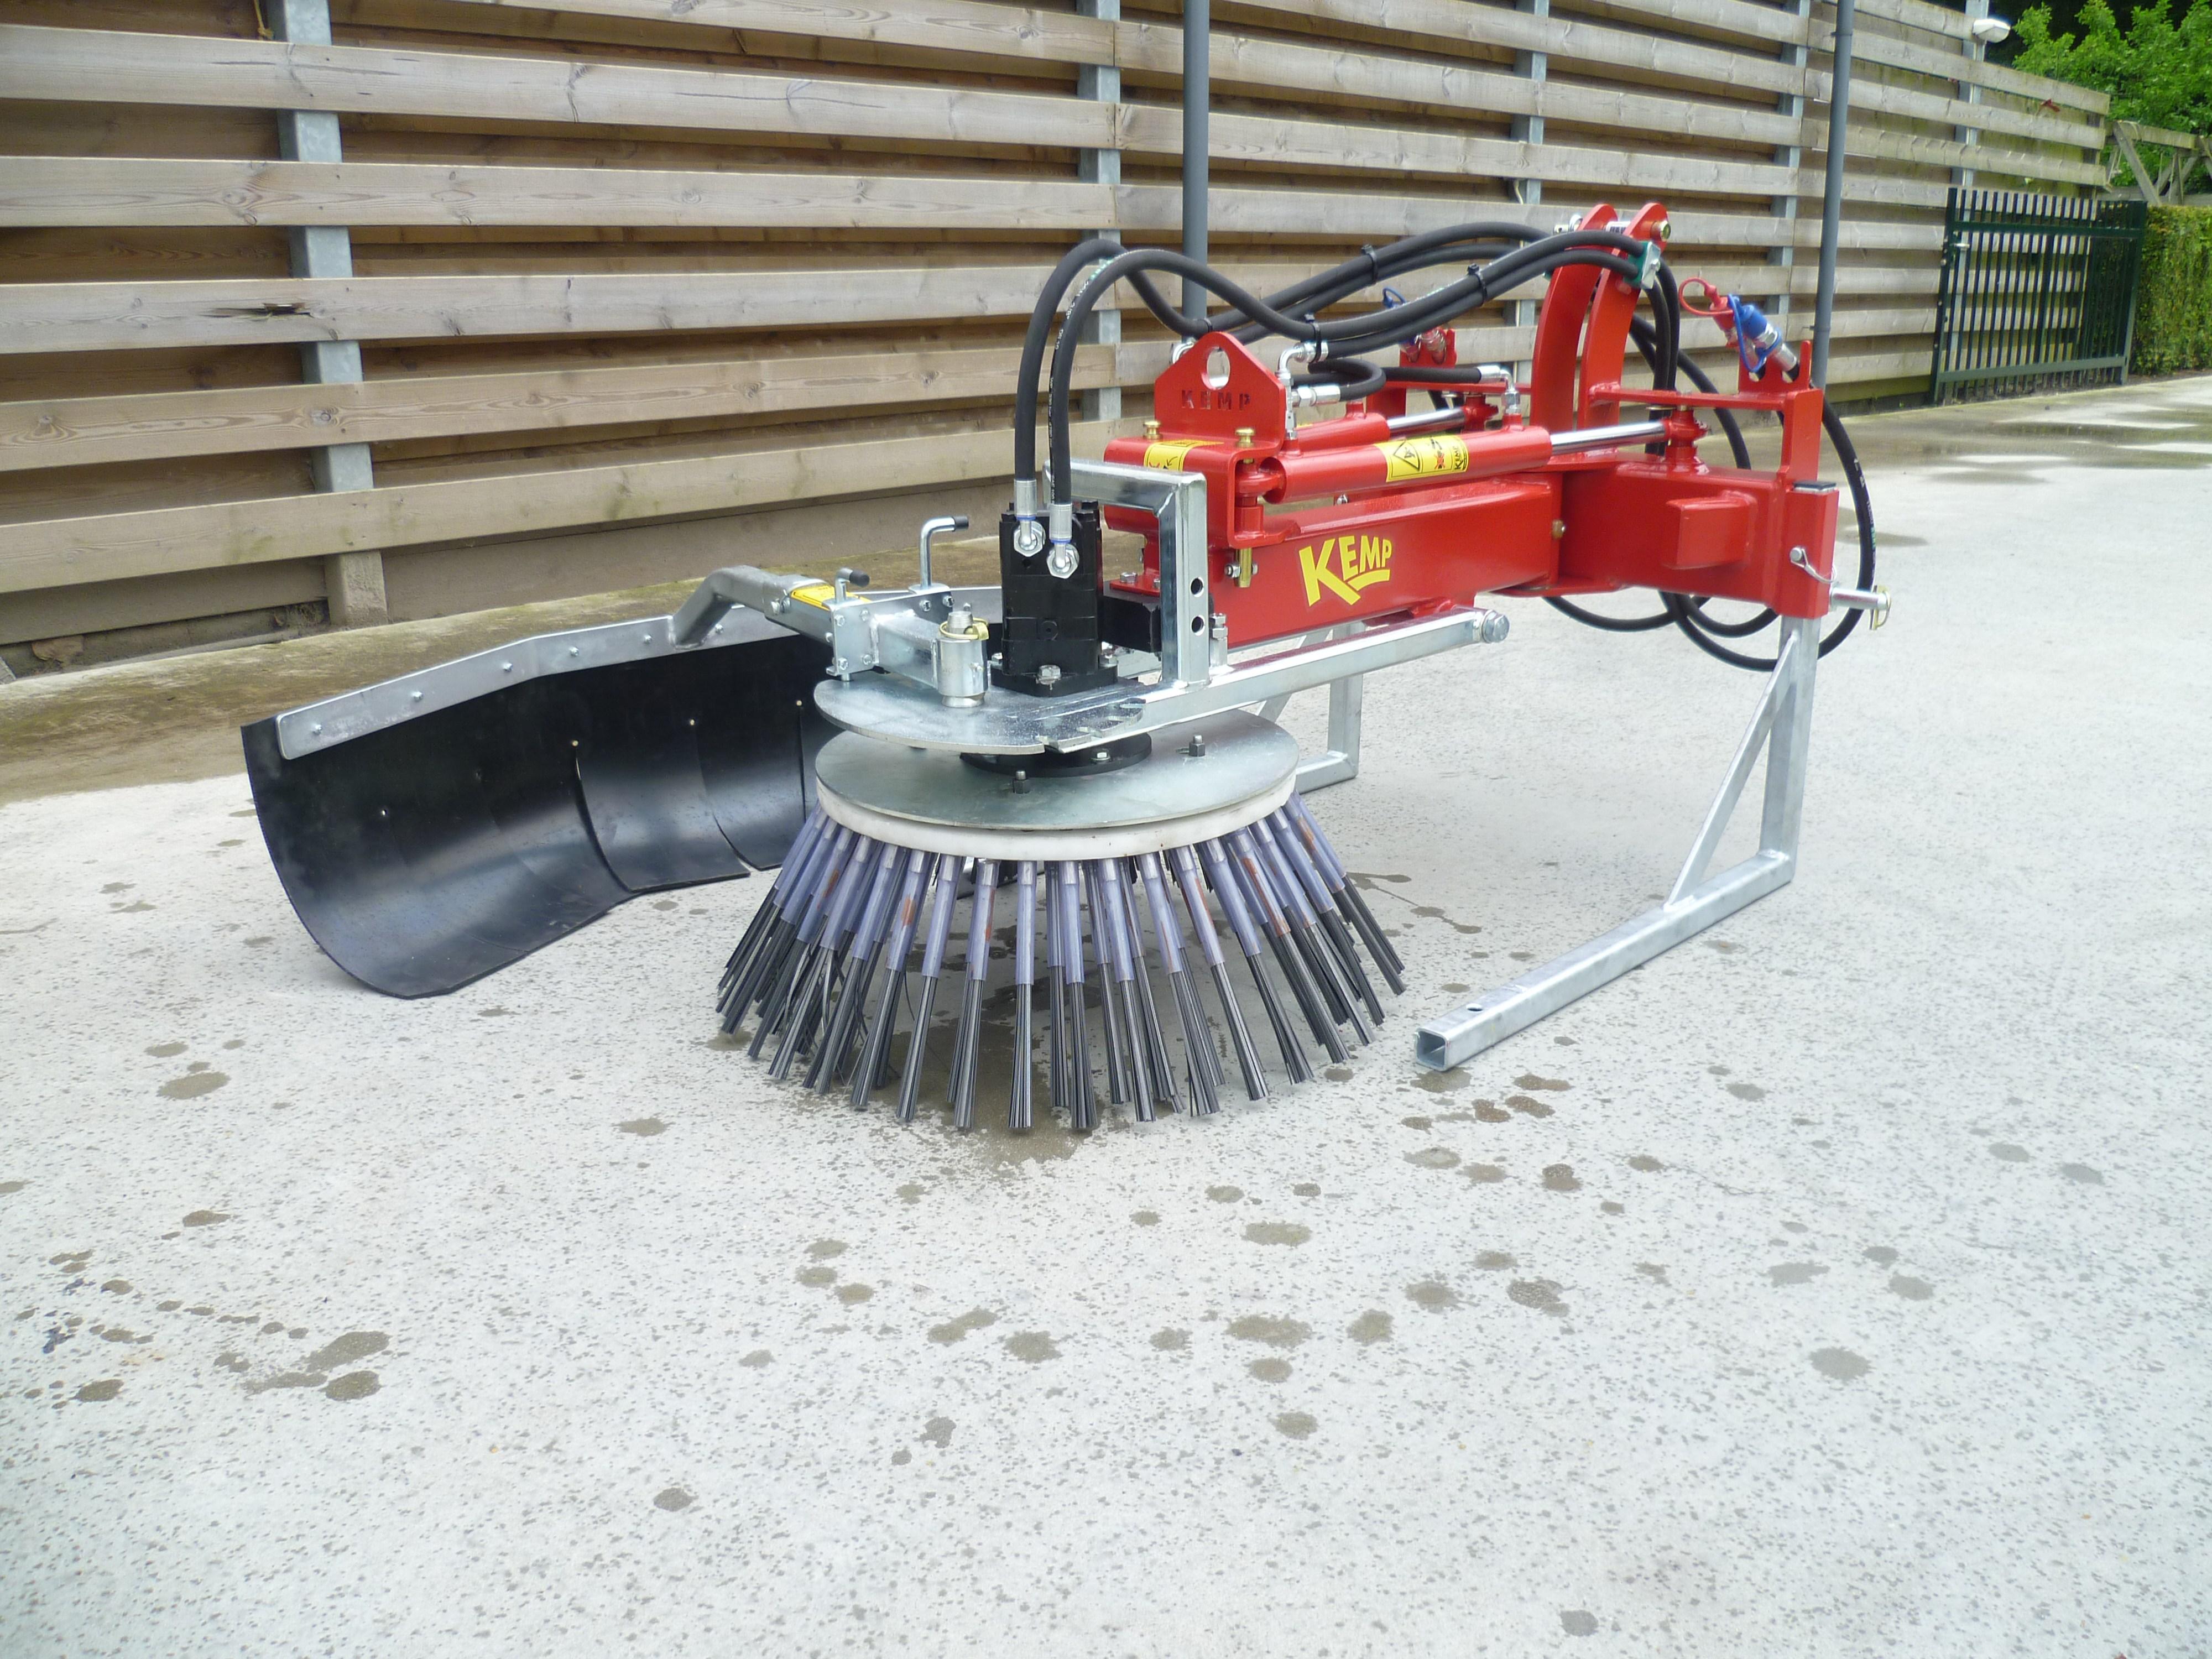 Ukrudtsbørste-Kemp-machines-1